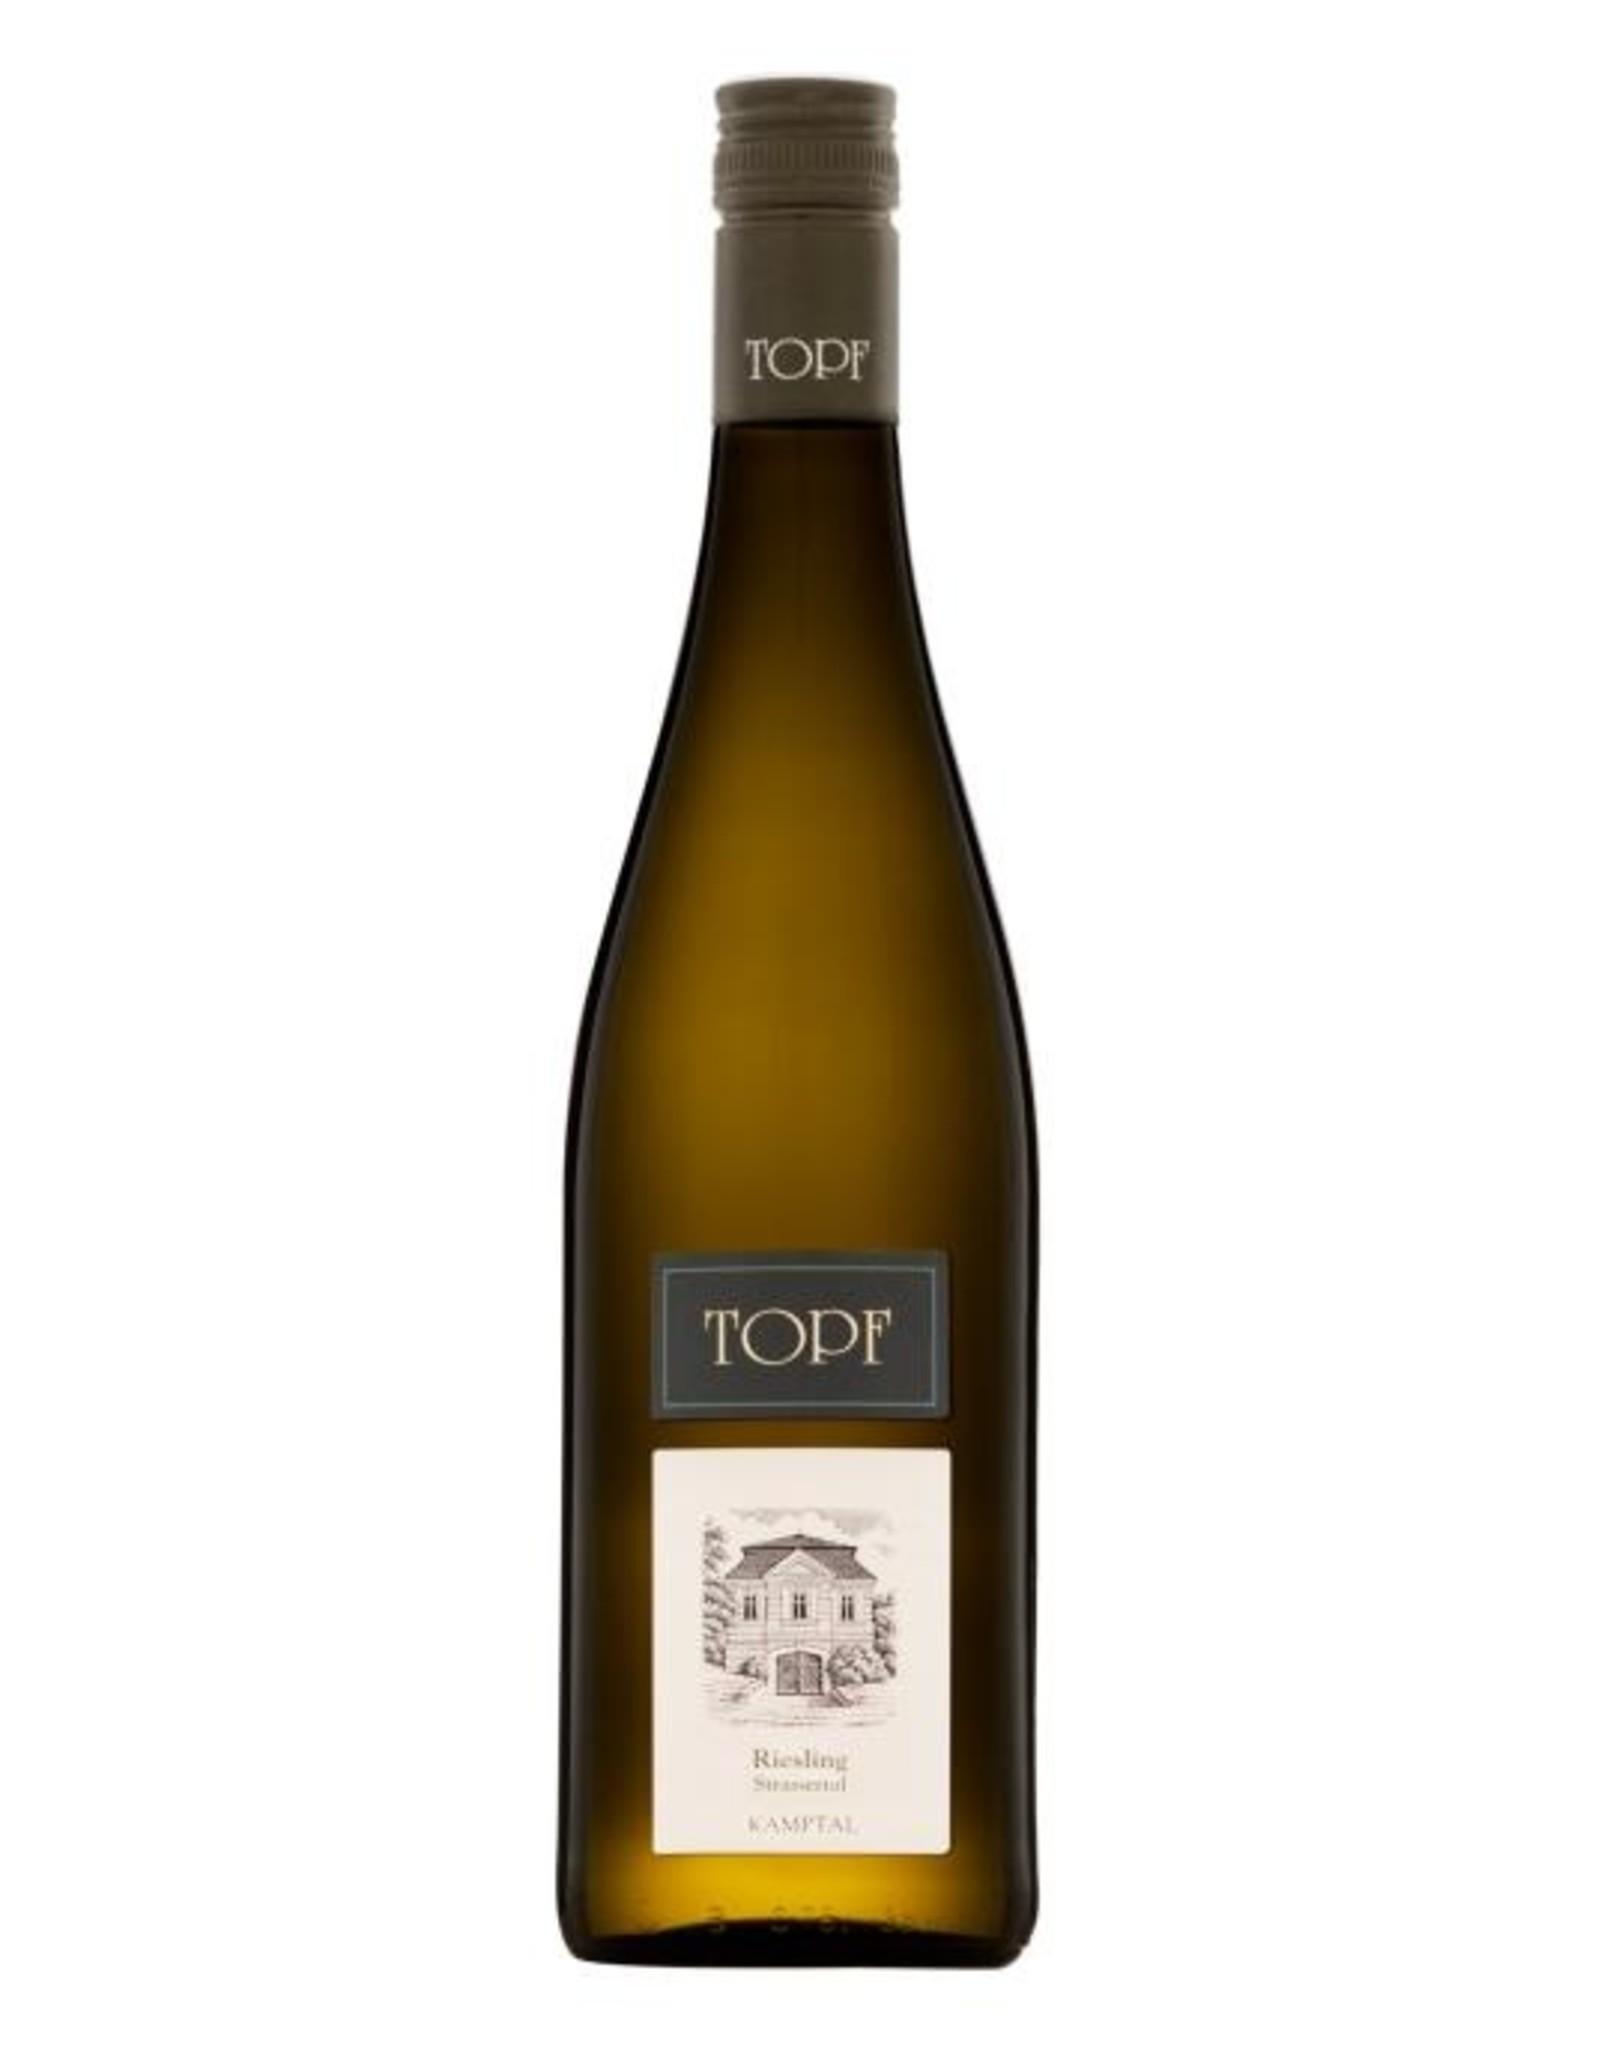 Topf Topf Riesling Strassertal Blanc 75cl